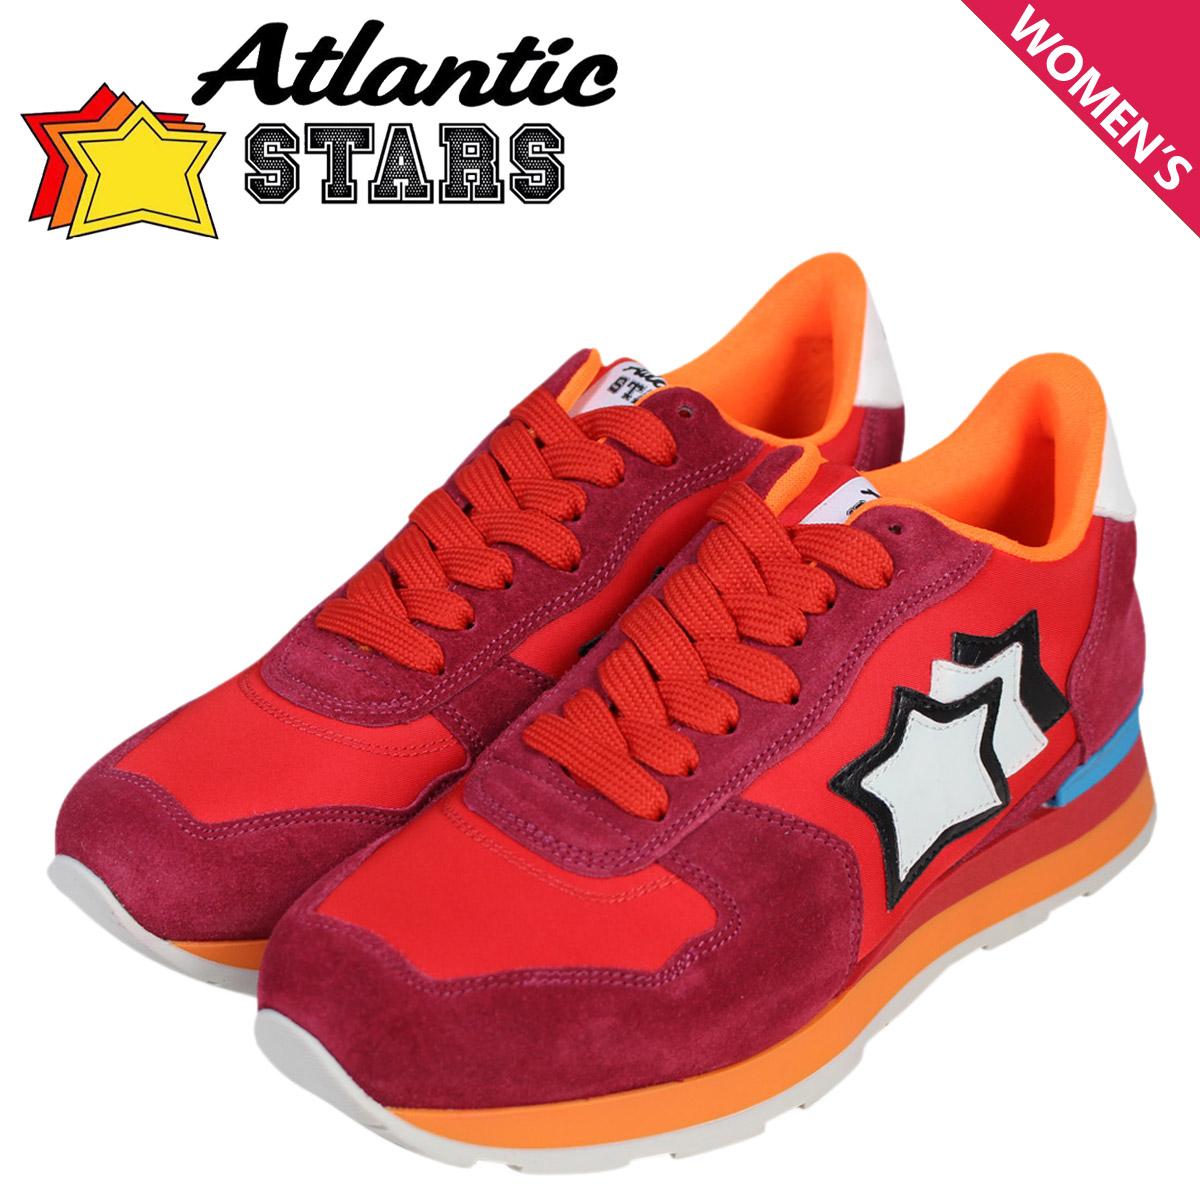 Atlantic STARS レディース スニーカー アトランティックスターズ ベガ VEGA FRA-85C レッド